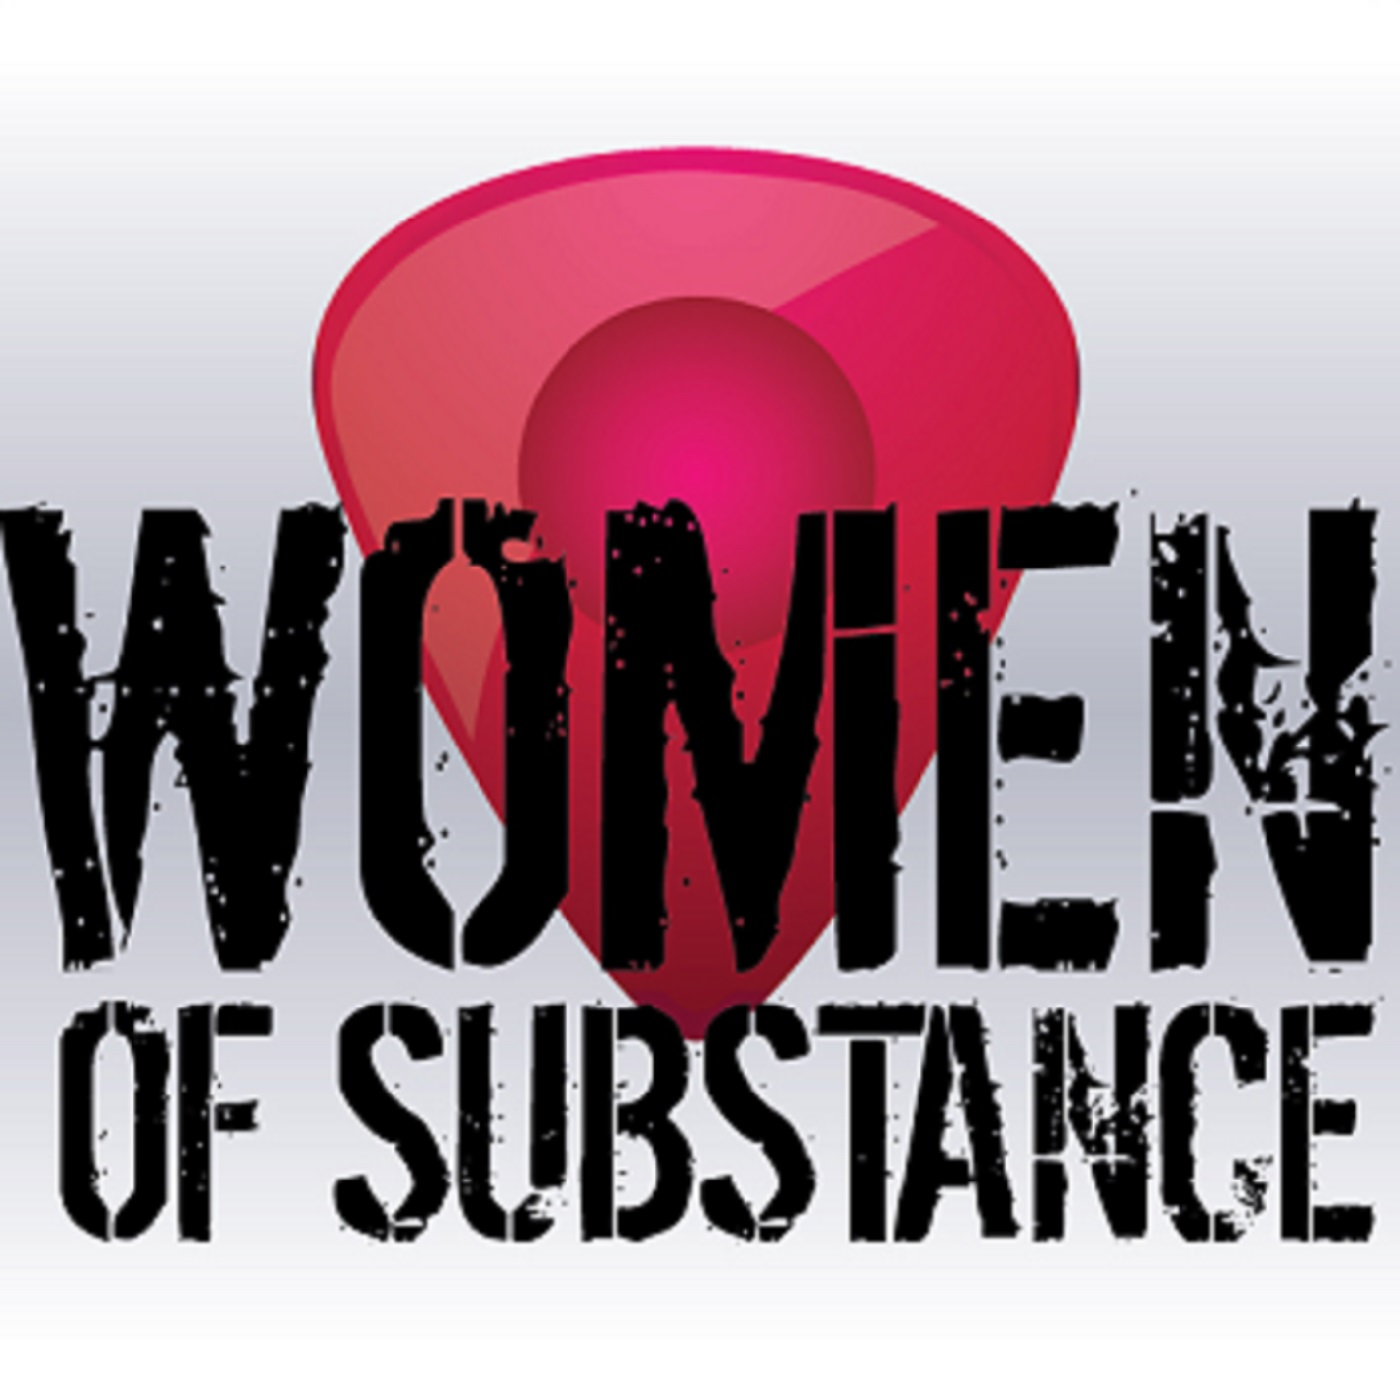 Artwork for #911 Music by Lisa Imondi, Angela Davis, Donna Gentile, Julie Ludgate, Weather McNabb, Roberta Schultz, ENIL Sounds, Laura Suarez, Cenzina, Koral Delatierra